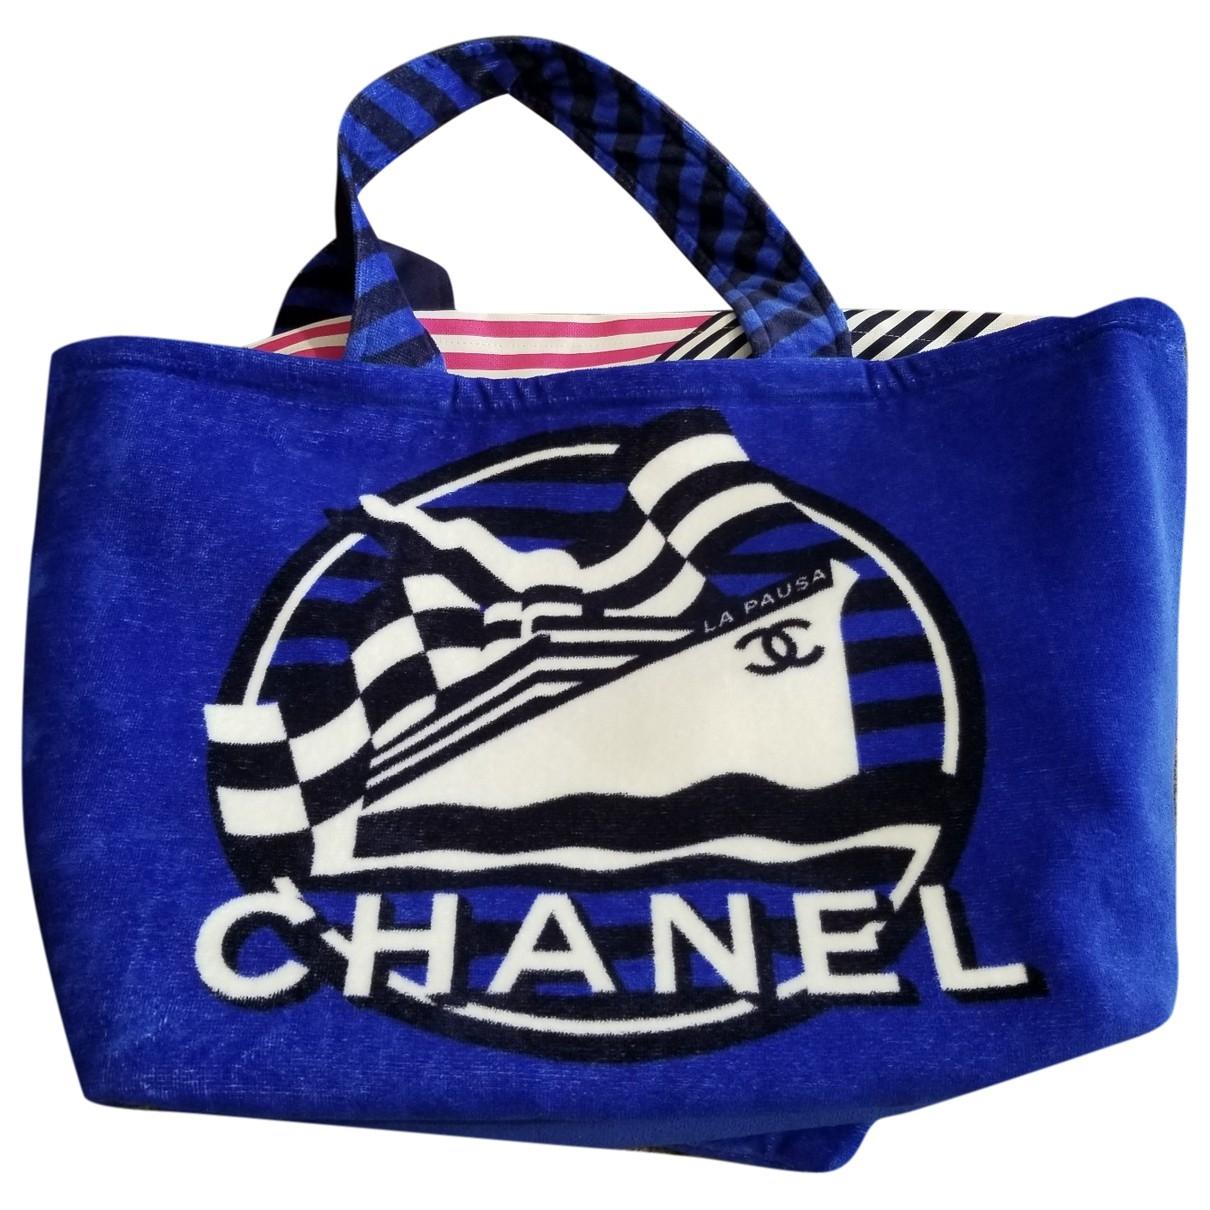 Chanel \N Blue Cotton handbag for Women \N